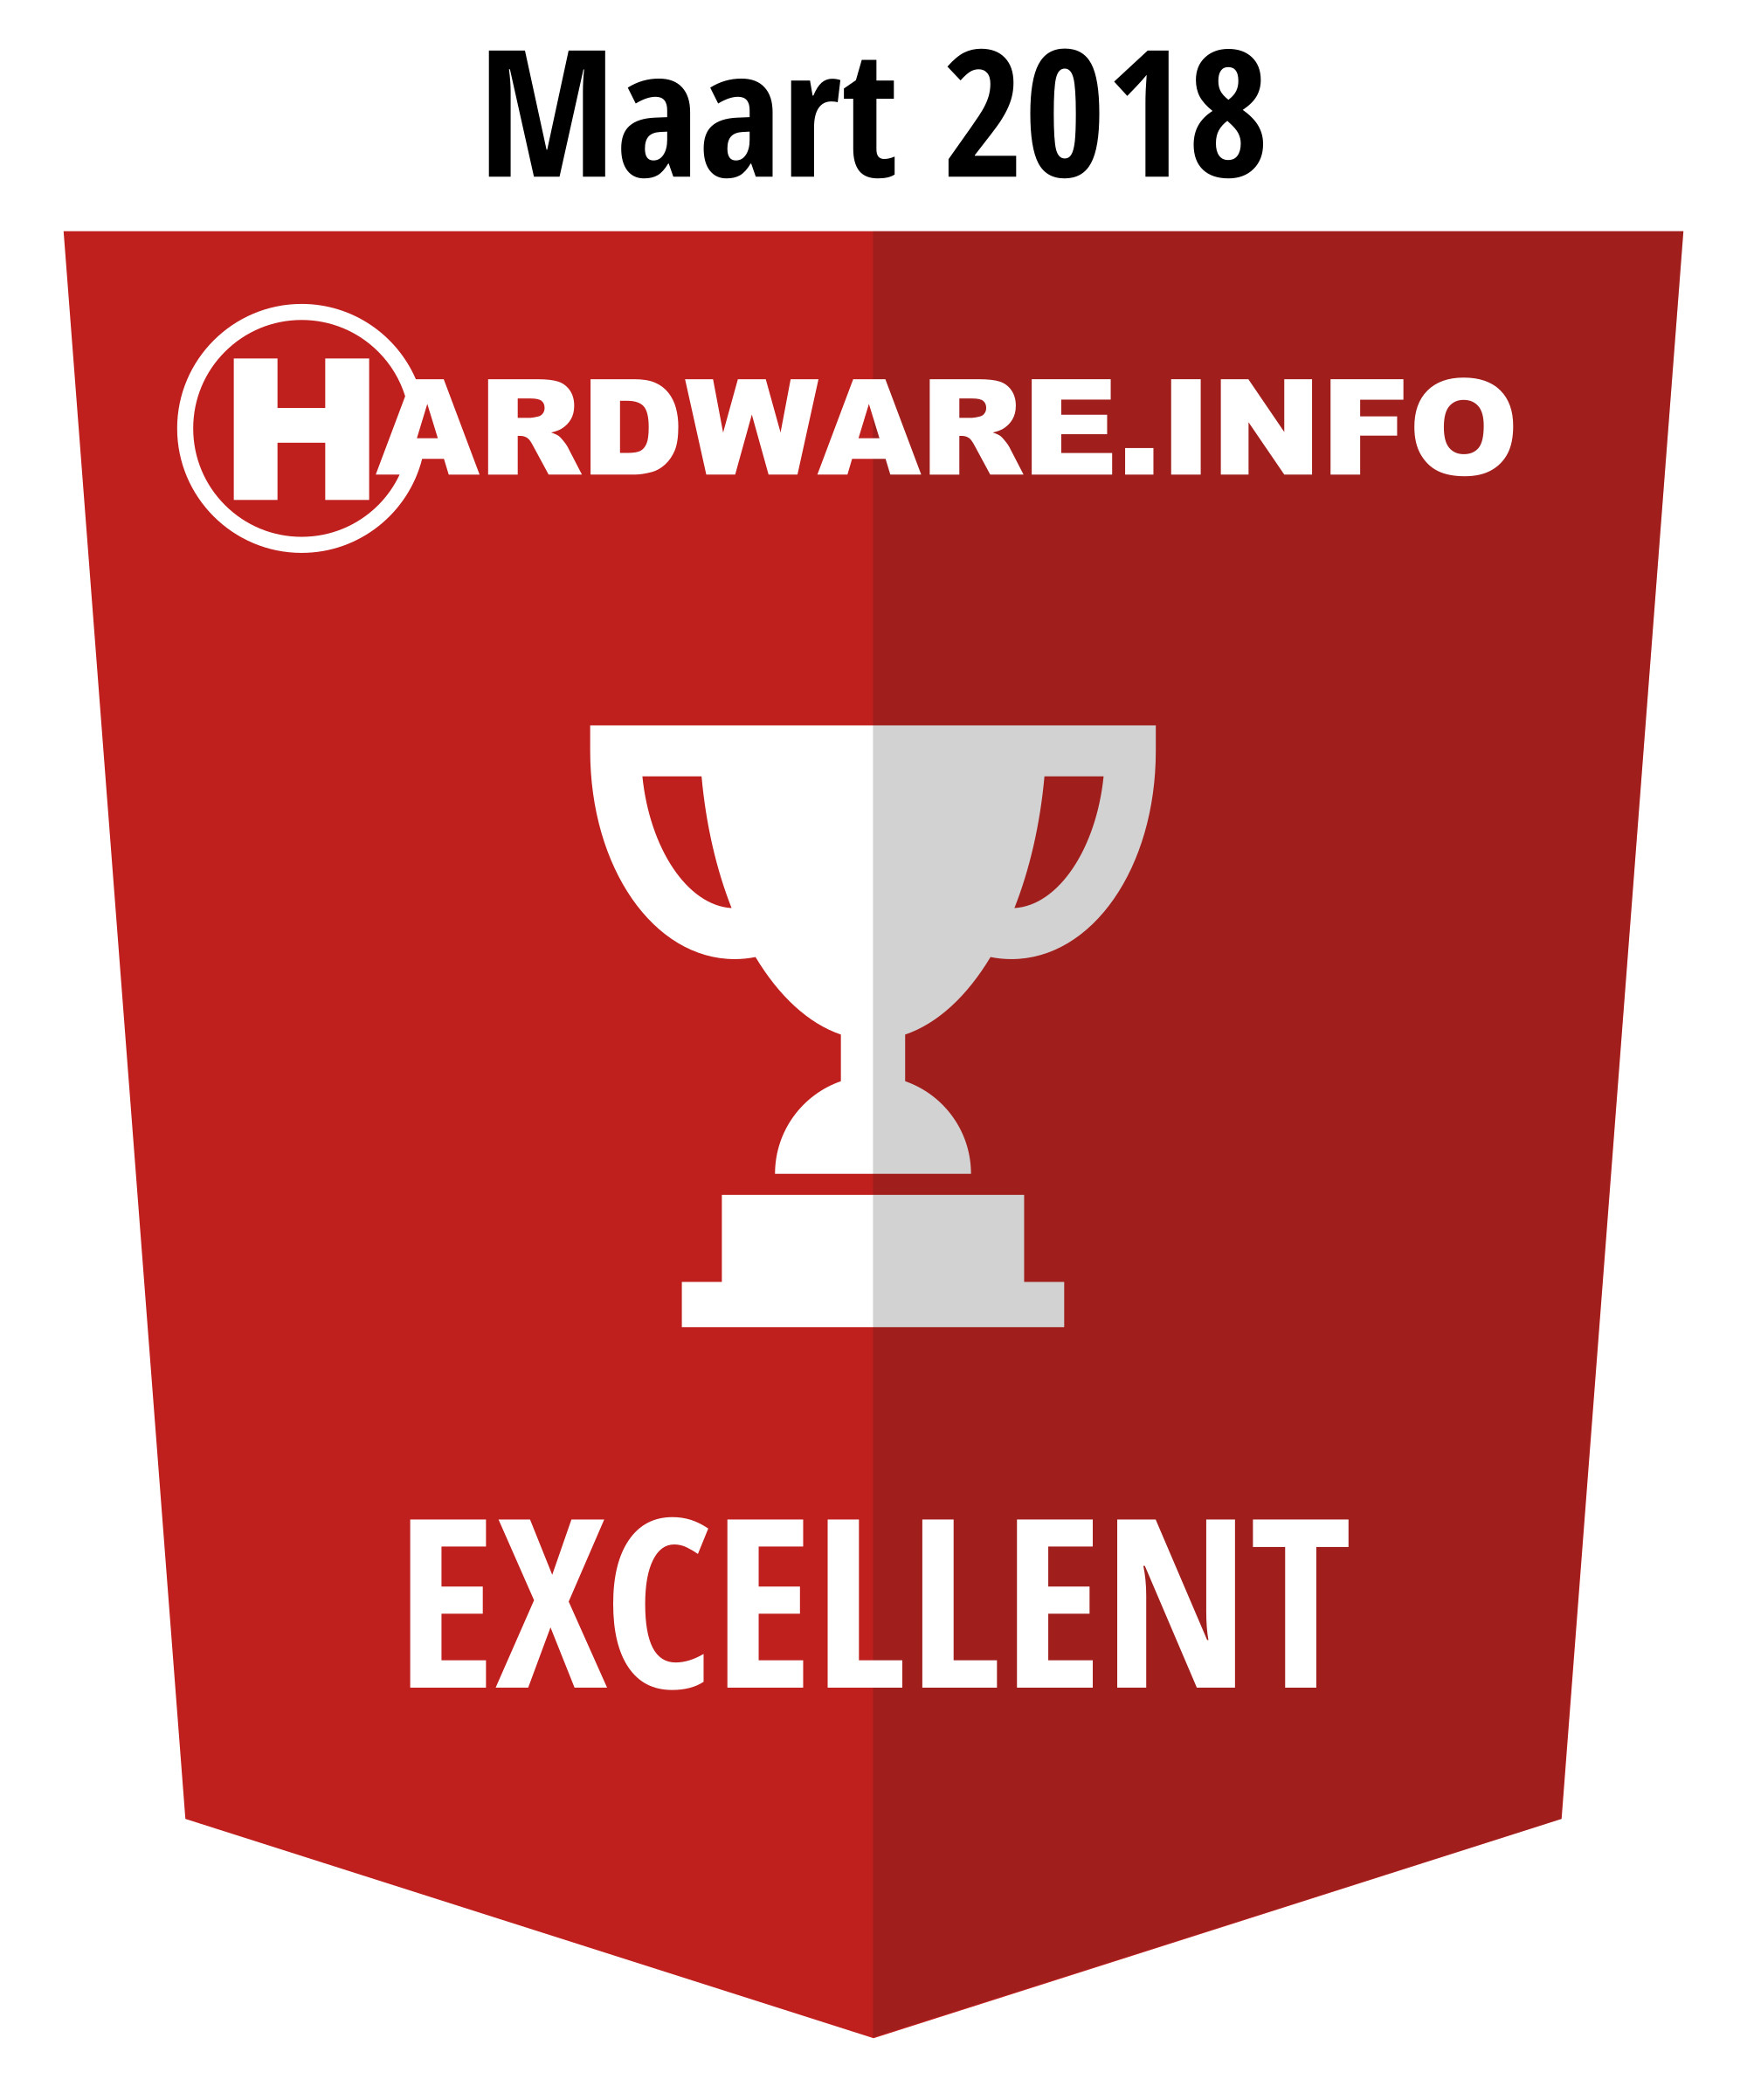 Hardware.info Excellent award 03-2018